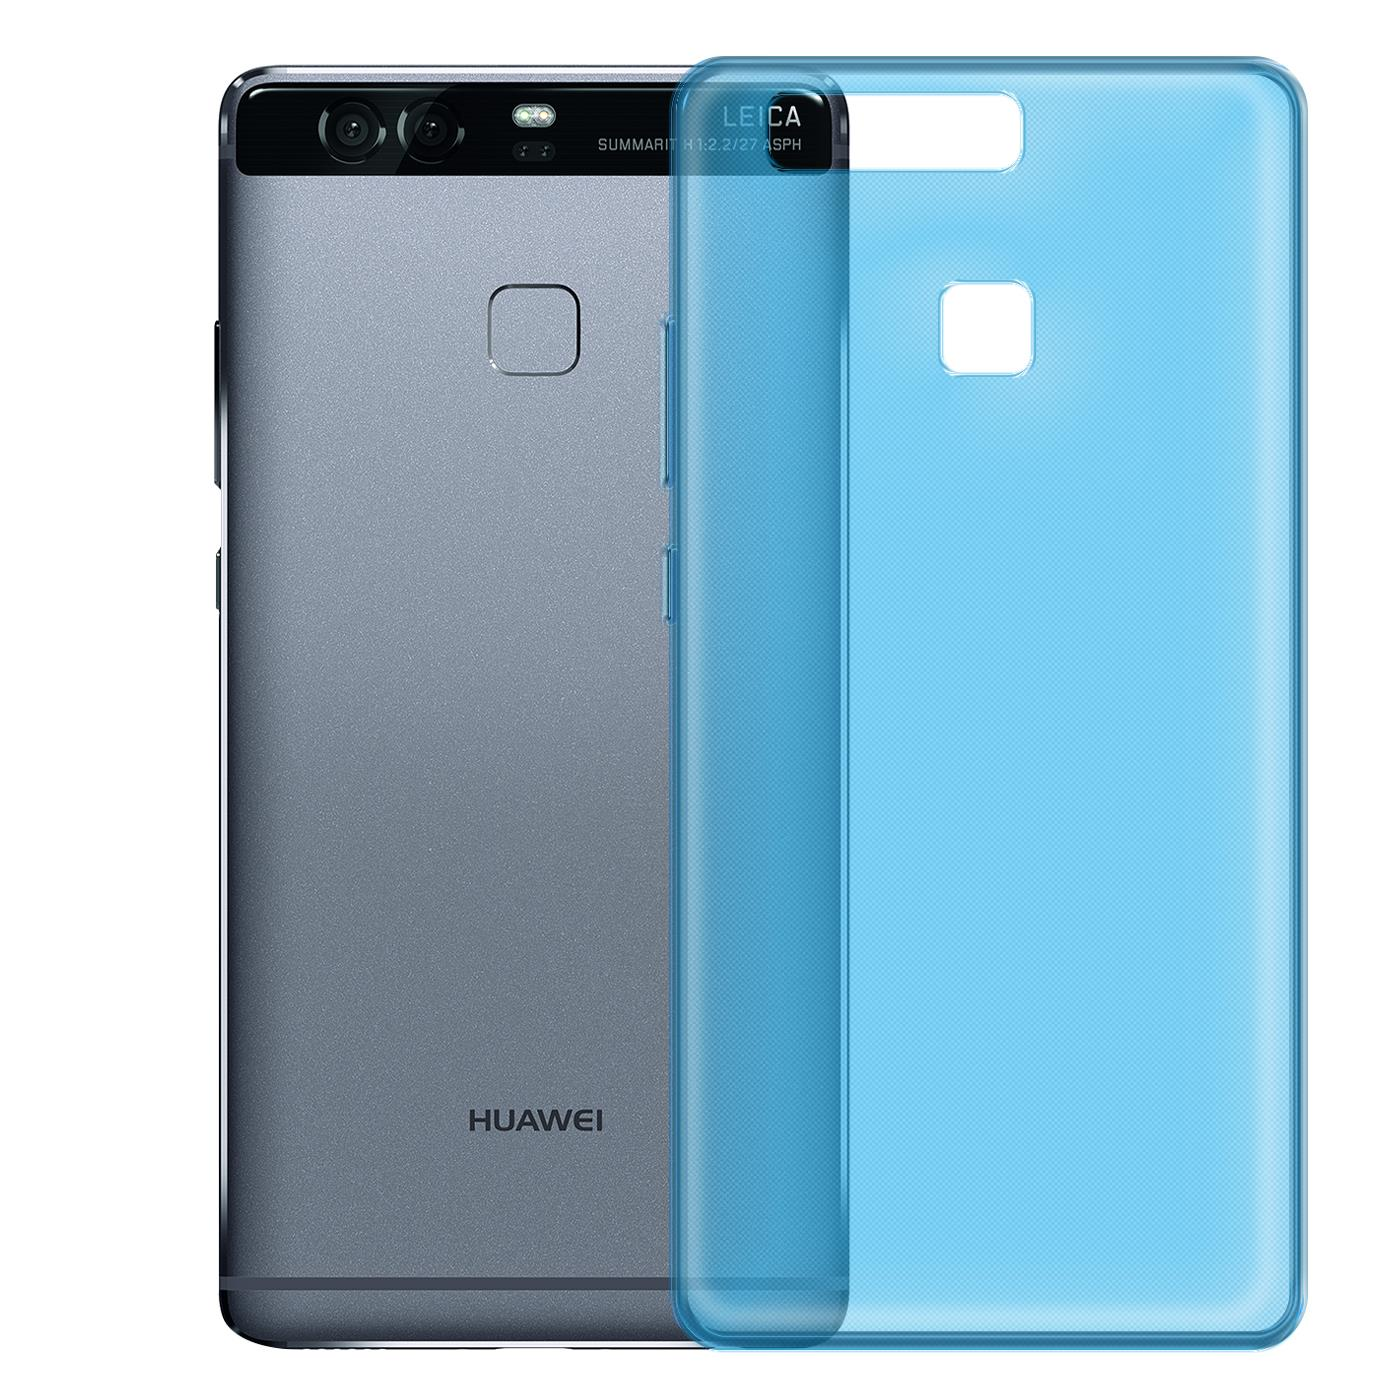 Huawei-p9-Duenn-Silikon-Klar-Case-Cover-Ultra-Slim-Stossfeste-Gel-Rueckseite Indexbild 8